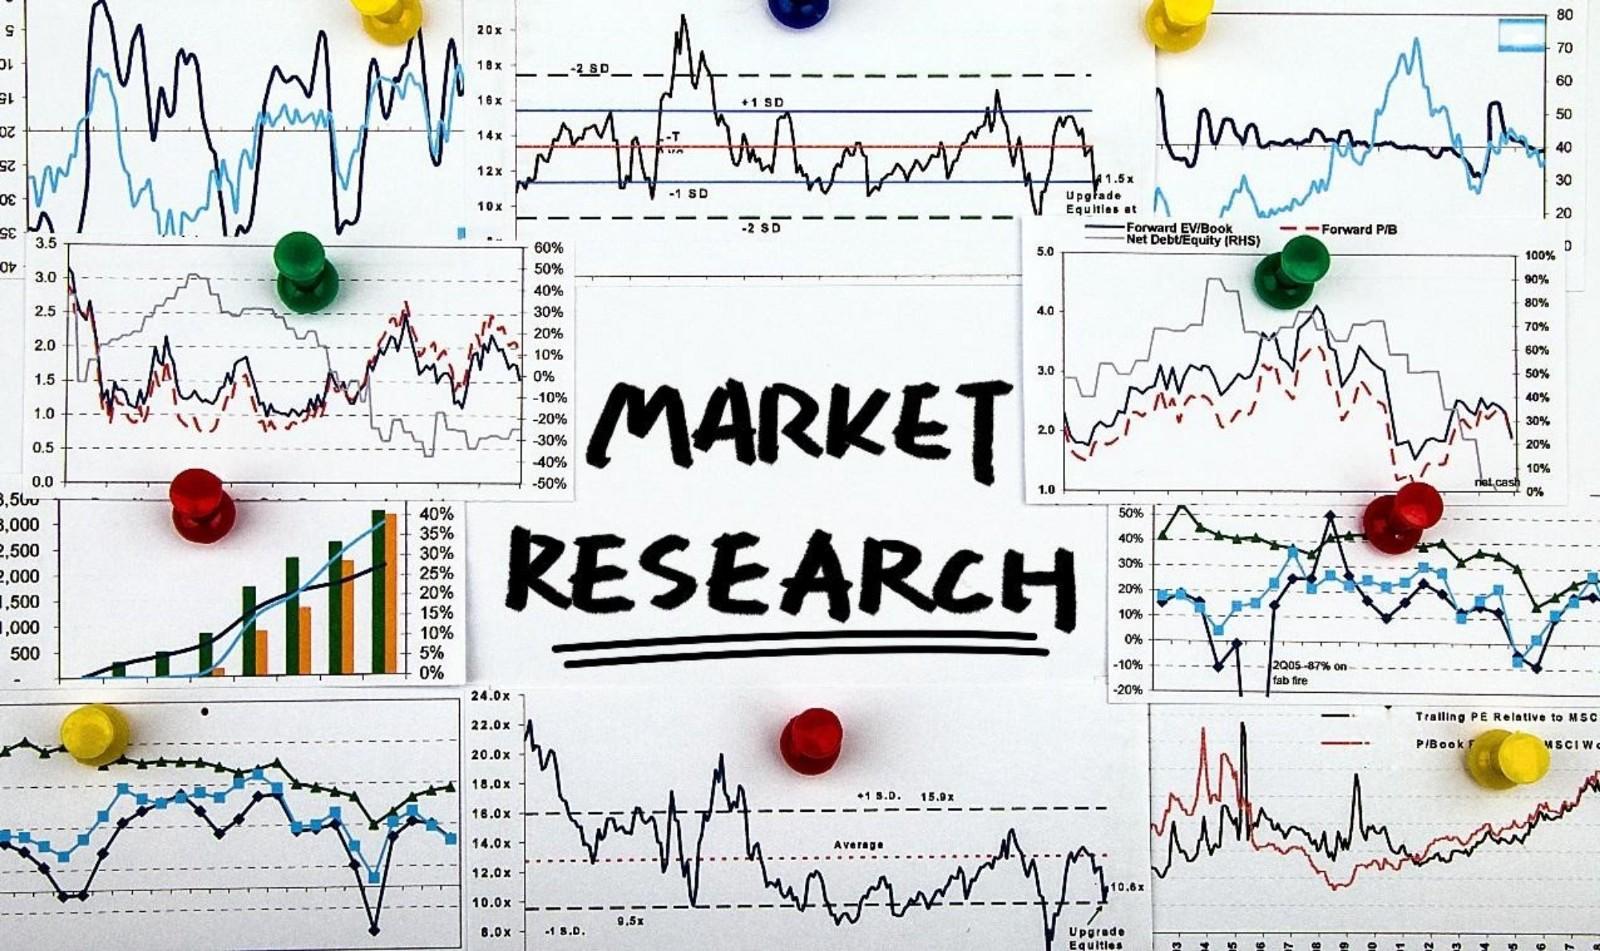 Produk research